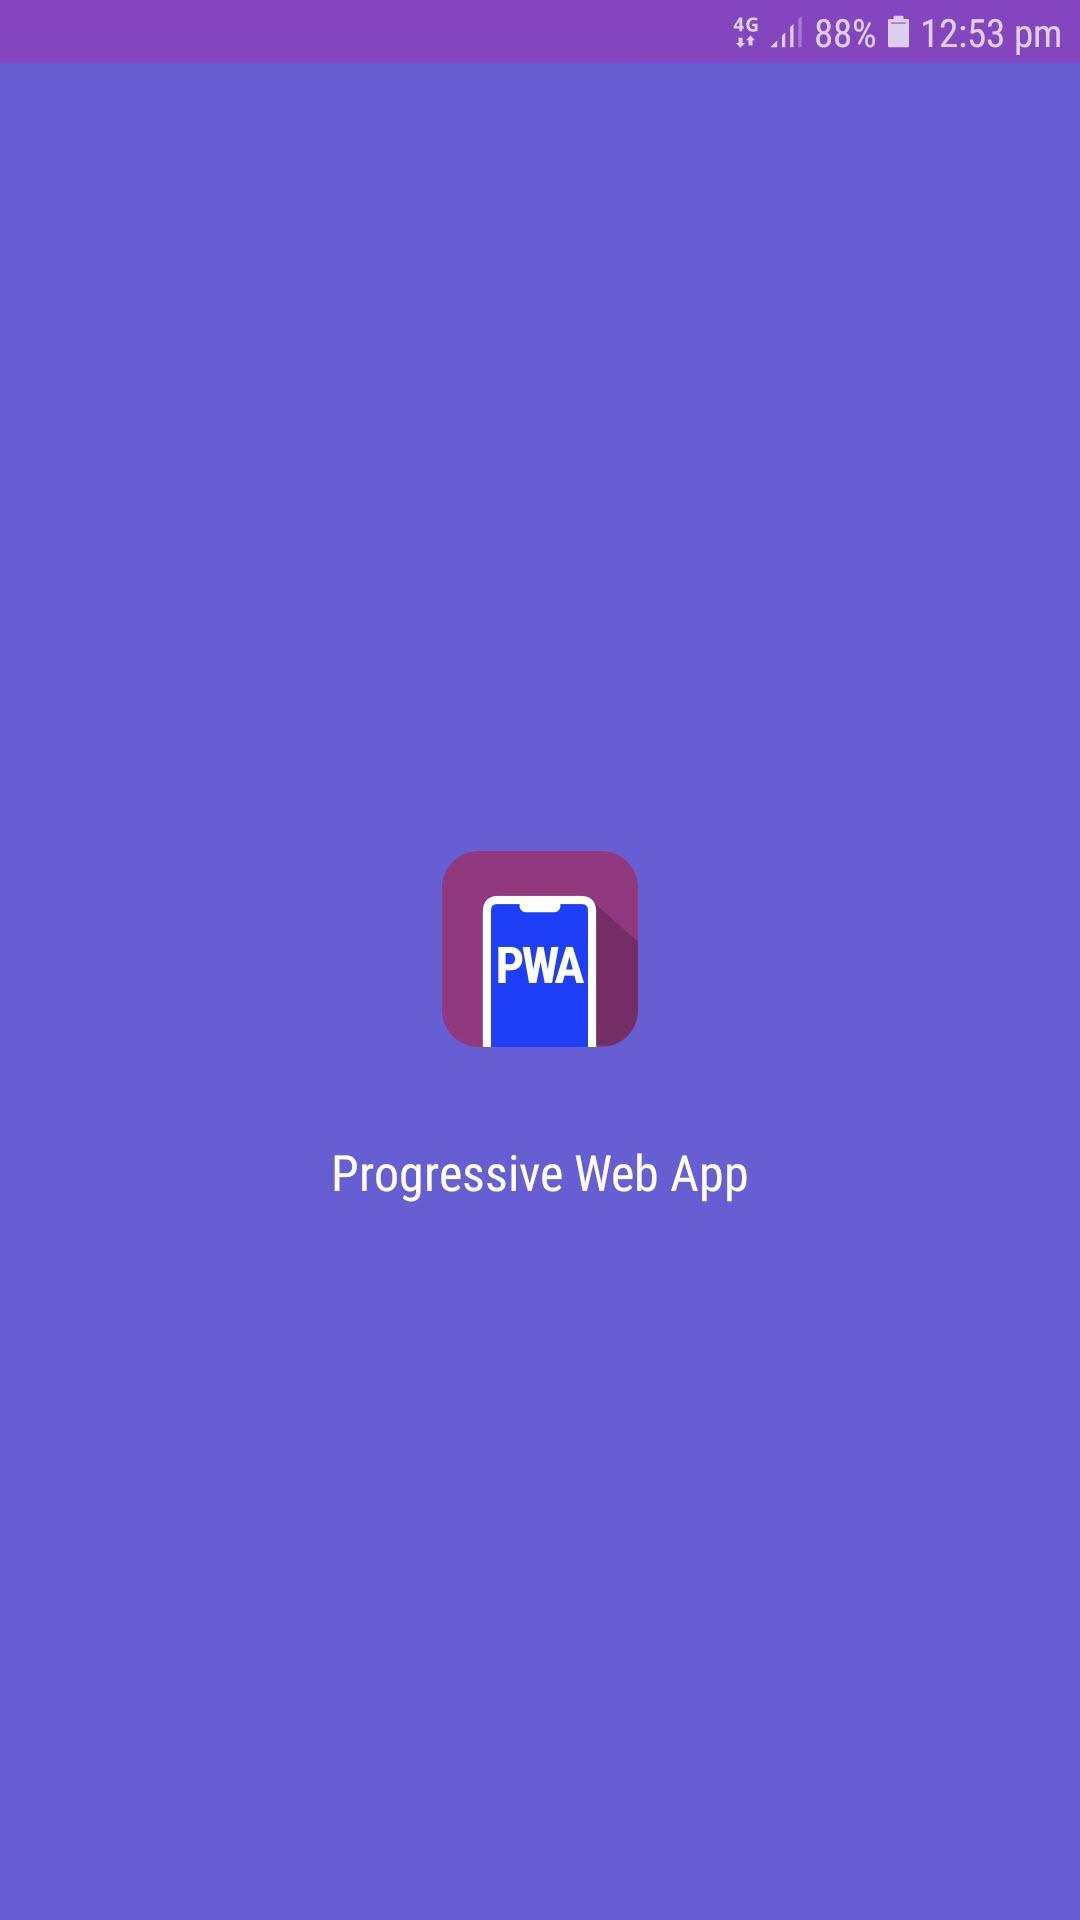 progressive web app for woocommerce webkul_pwa_wc_splash_screen